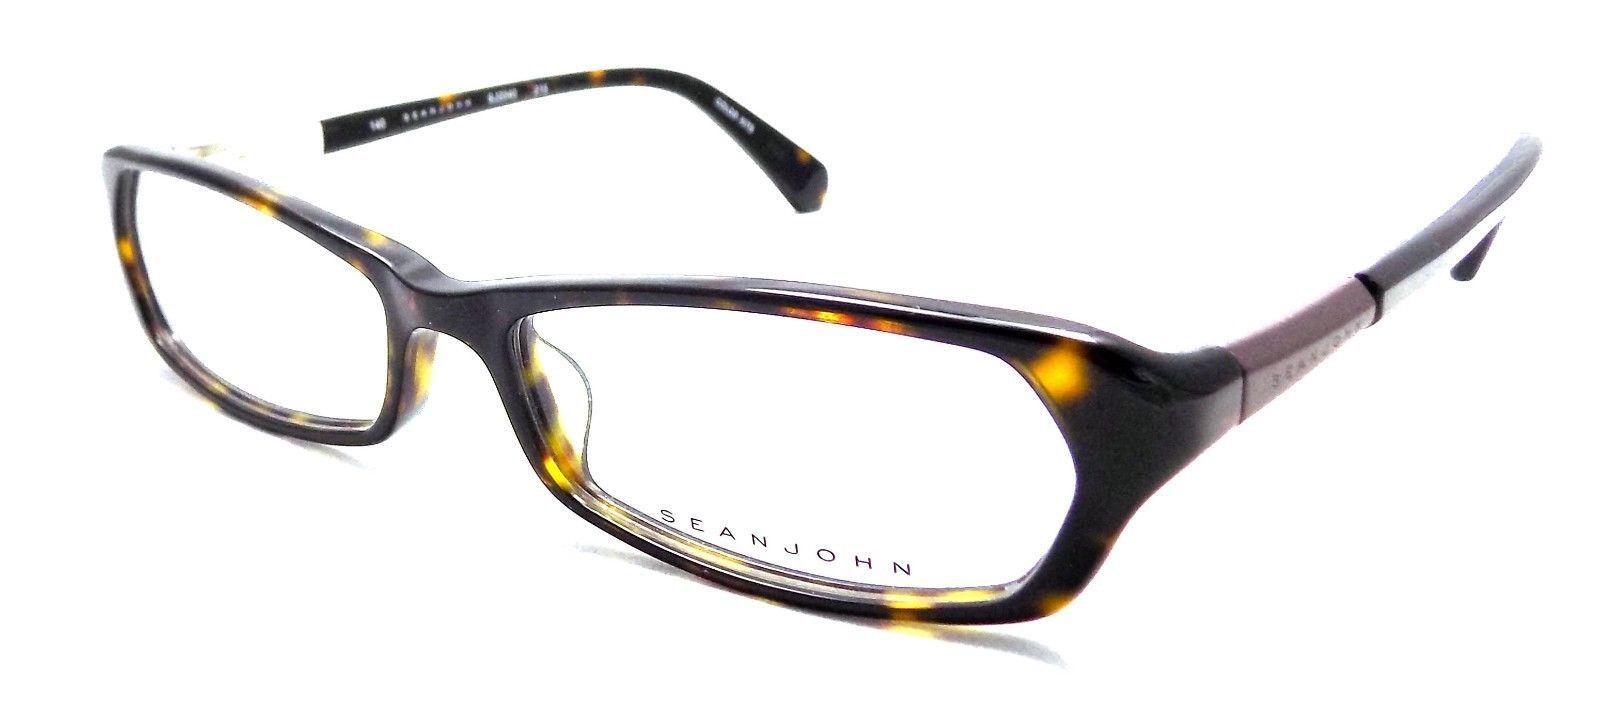 Sean John SJ2040 215 Rx Eyeglasses Frames and 10 similar items